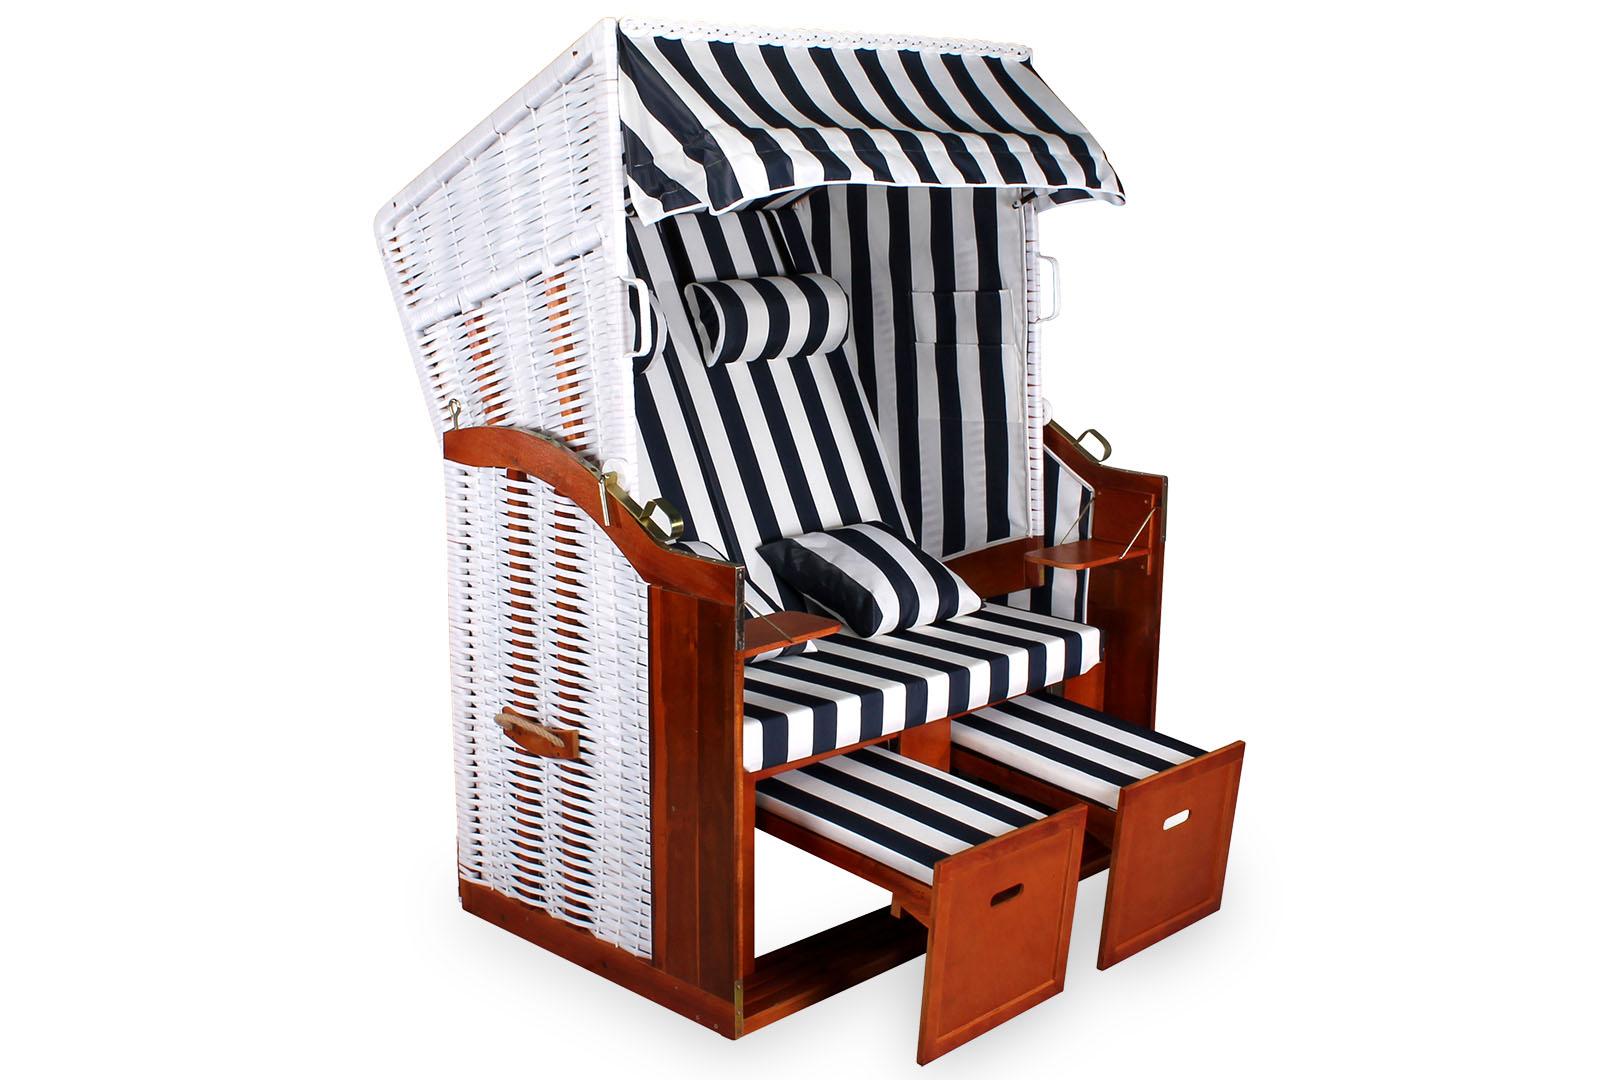 strandkorb usedom xxl rugbyclubeemland. Black Bedroom Furniture Sets. Home Design Ideas